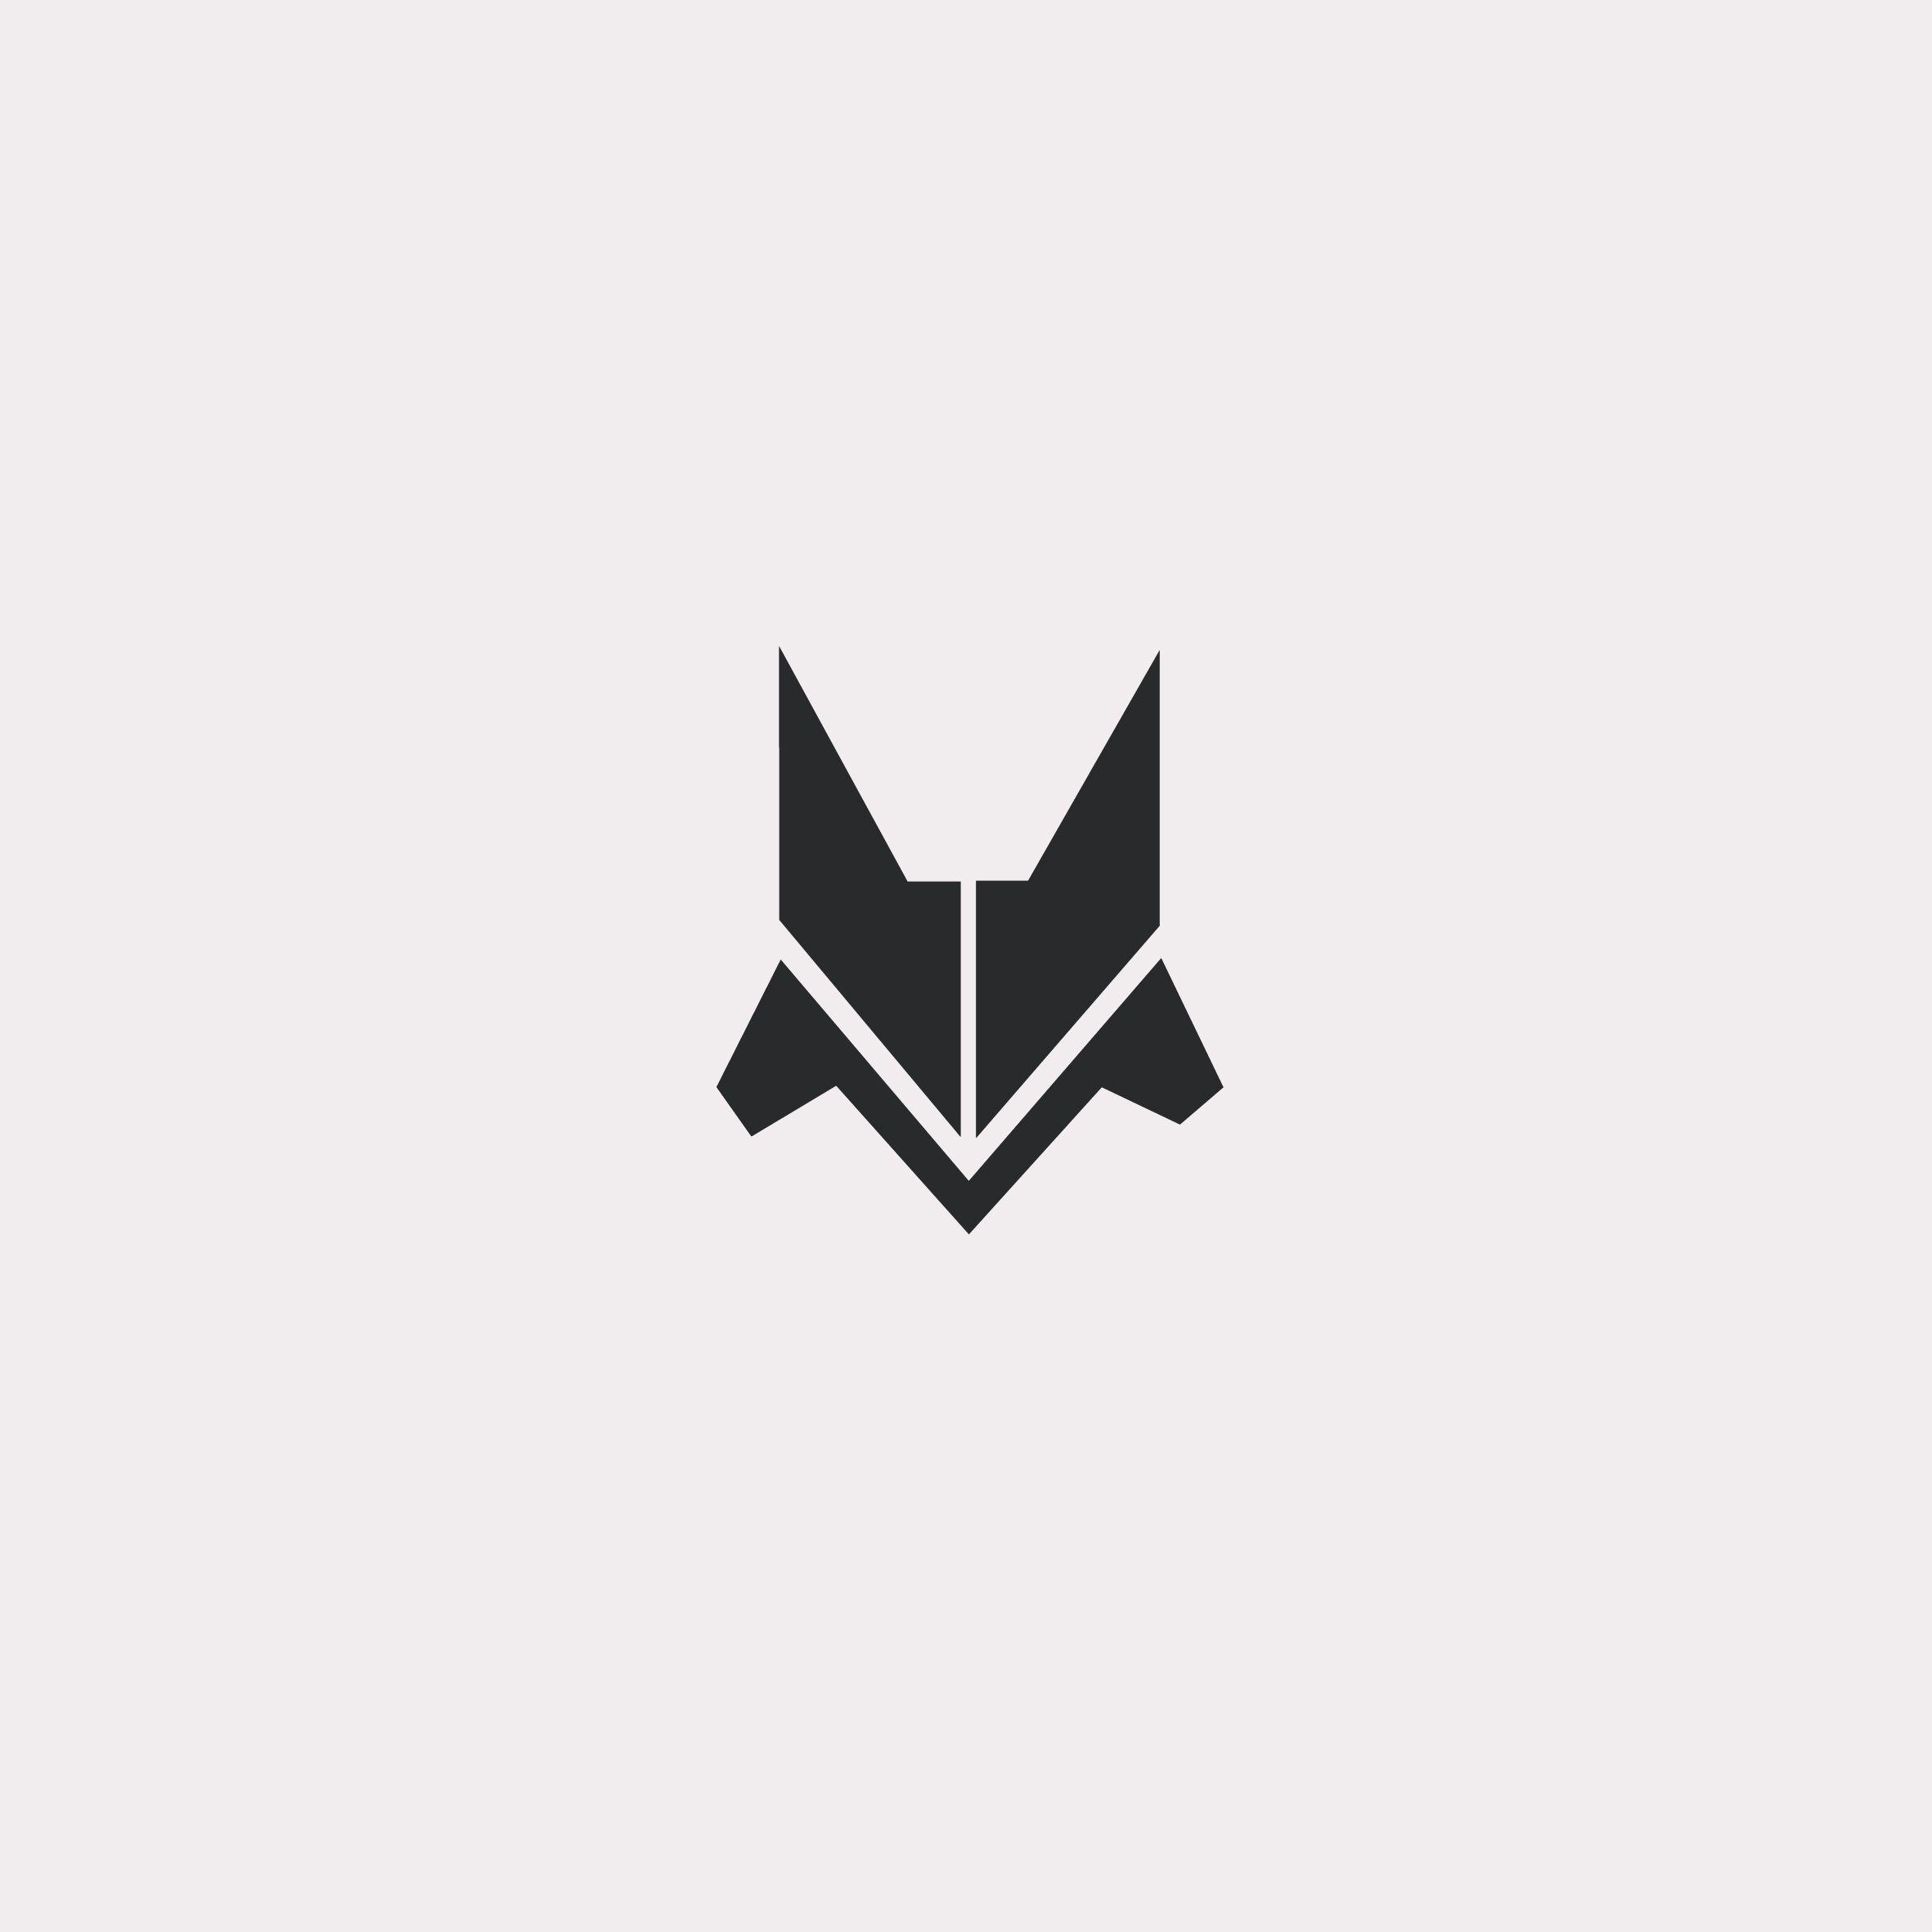 Geometric Logo Minimal Design Minimalist